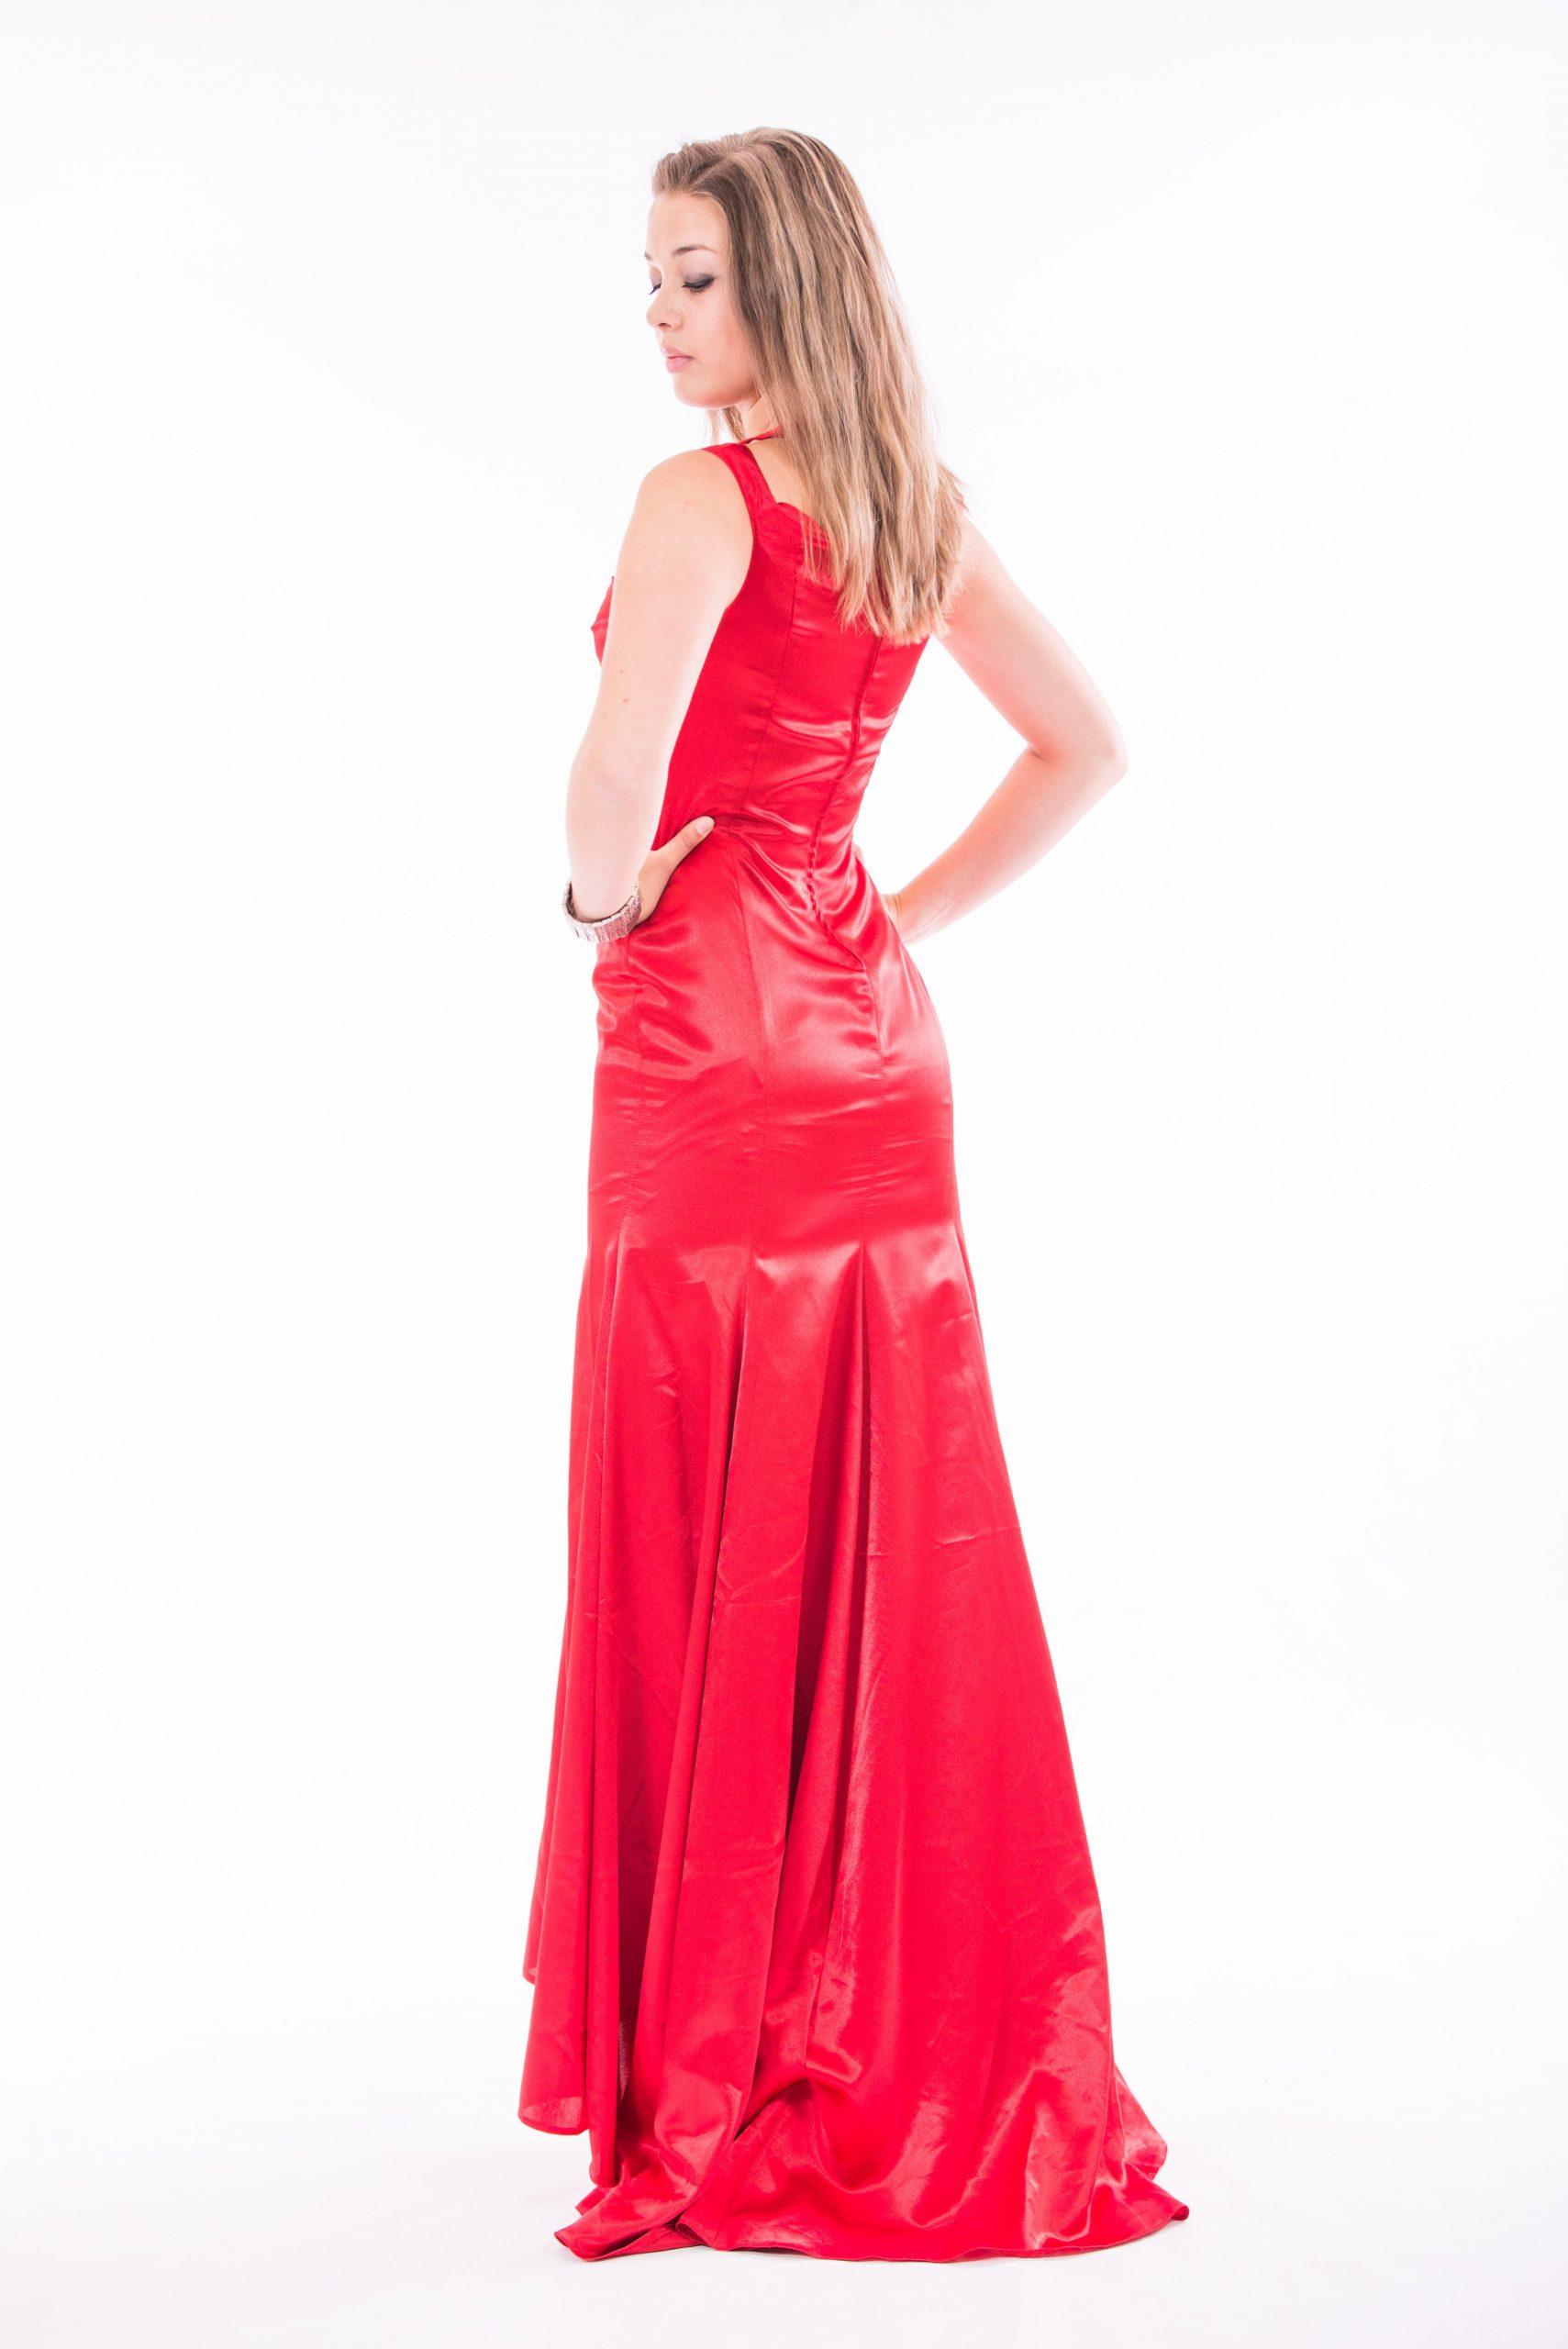 Crepe-backed Satin Evening Dress